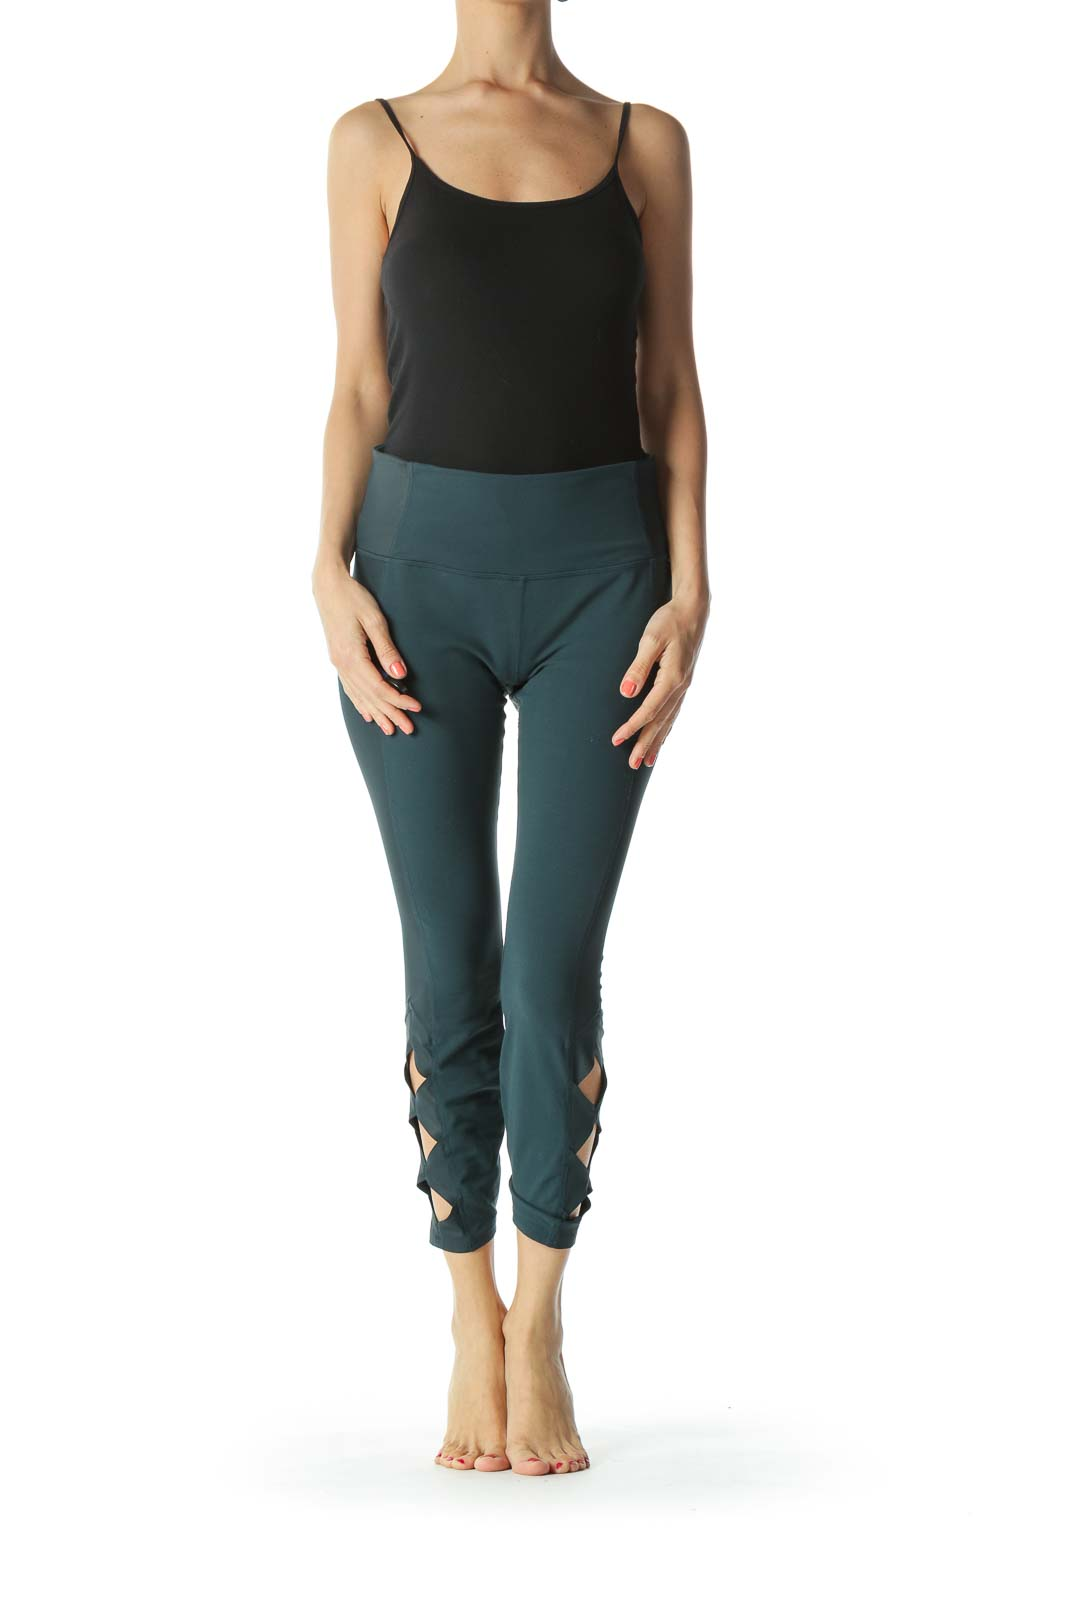 Emerald-Green Leg-Side-Geometric-Detail Leggings